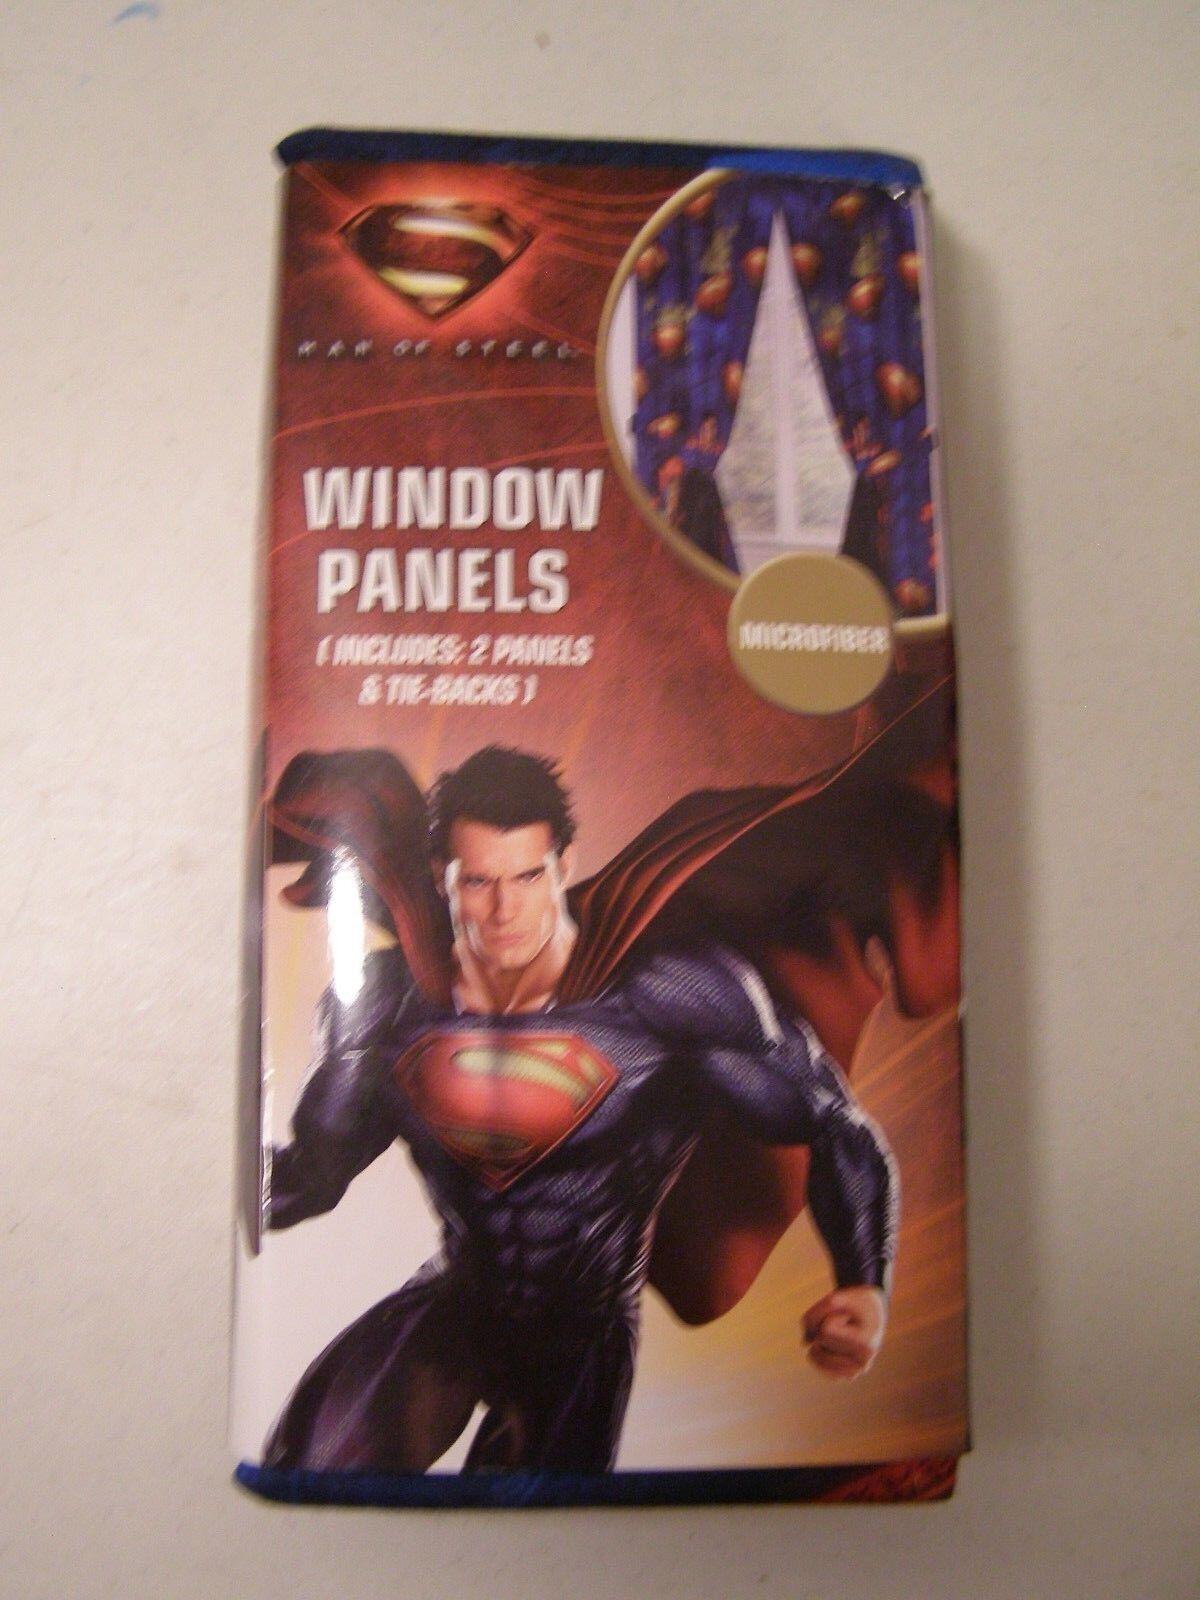 Superman Man of Steel Jay Franco Franco Franco and Sons Window Panels 0516b8